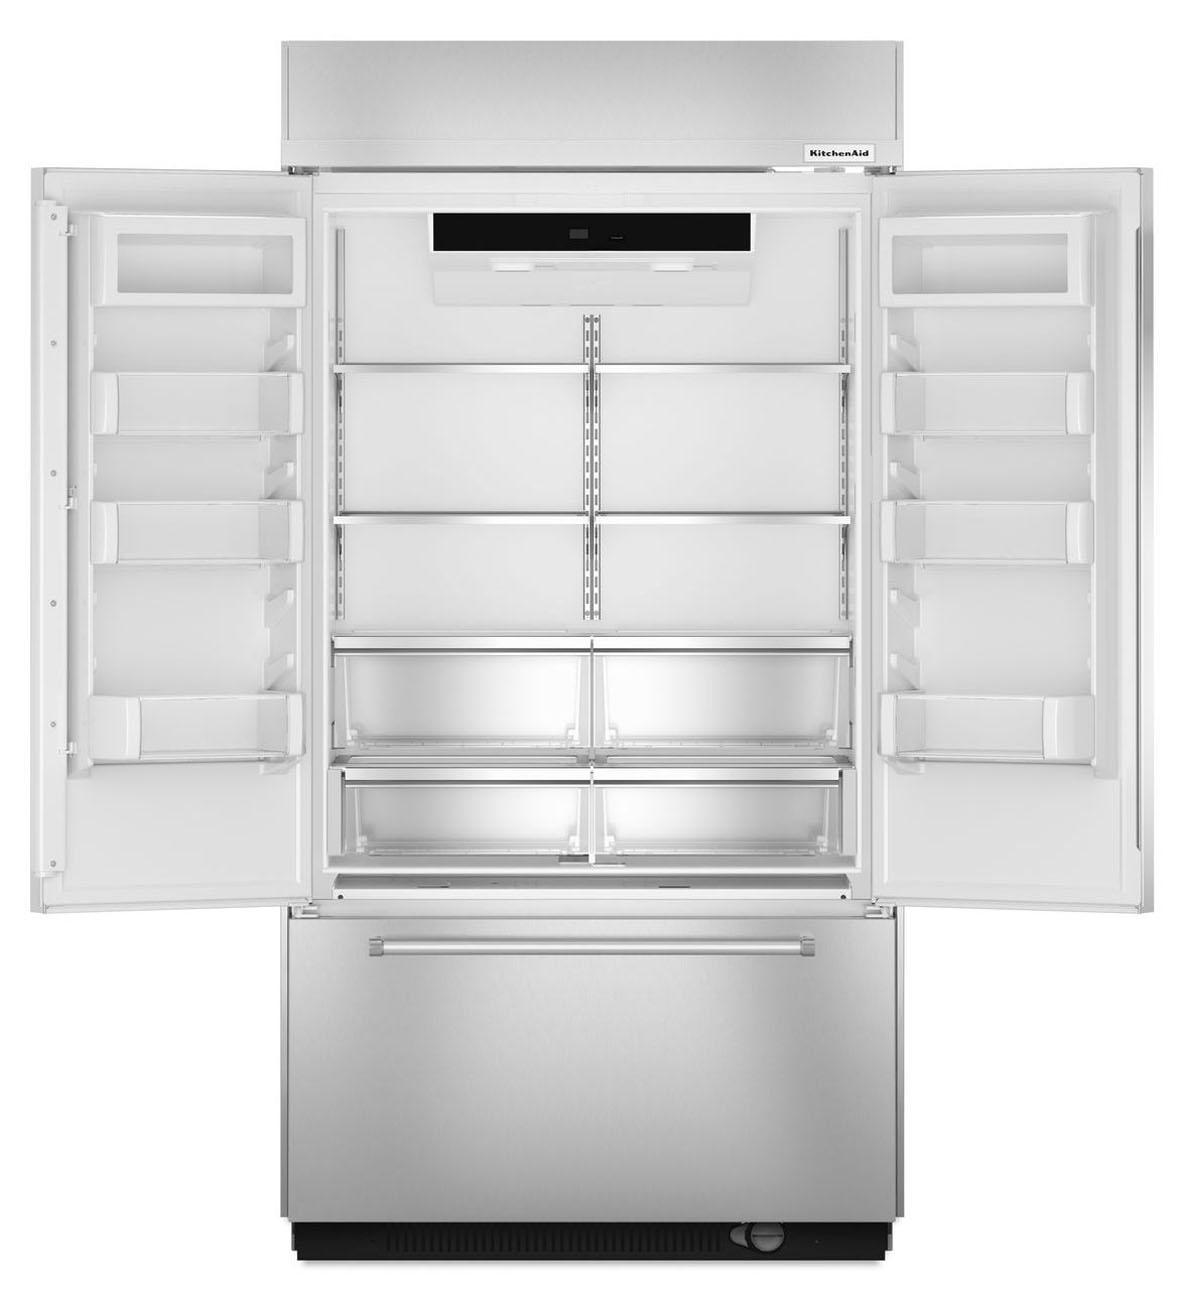 Kitchenaid Kbfc42fts kitchenaid built-in french door refrigerator - kbfn402ess